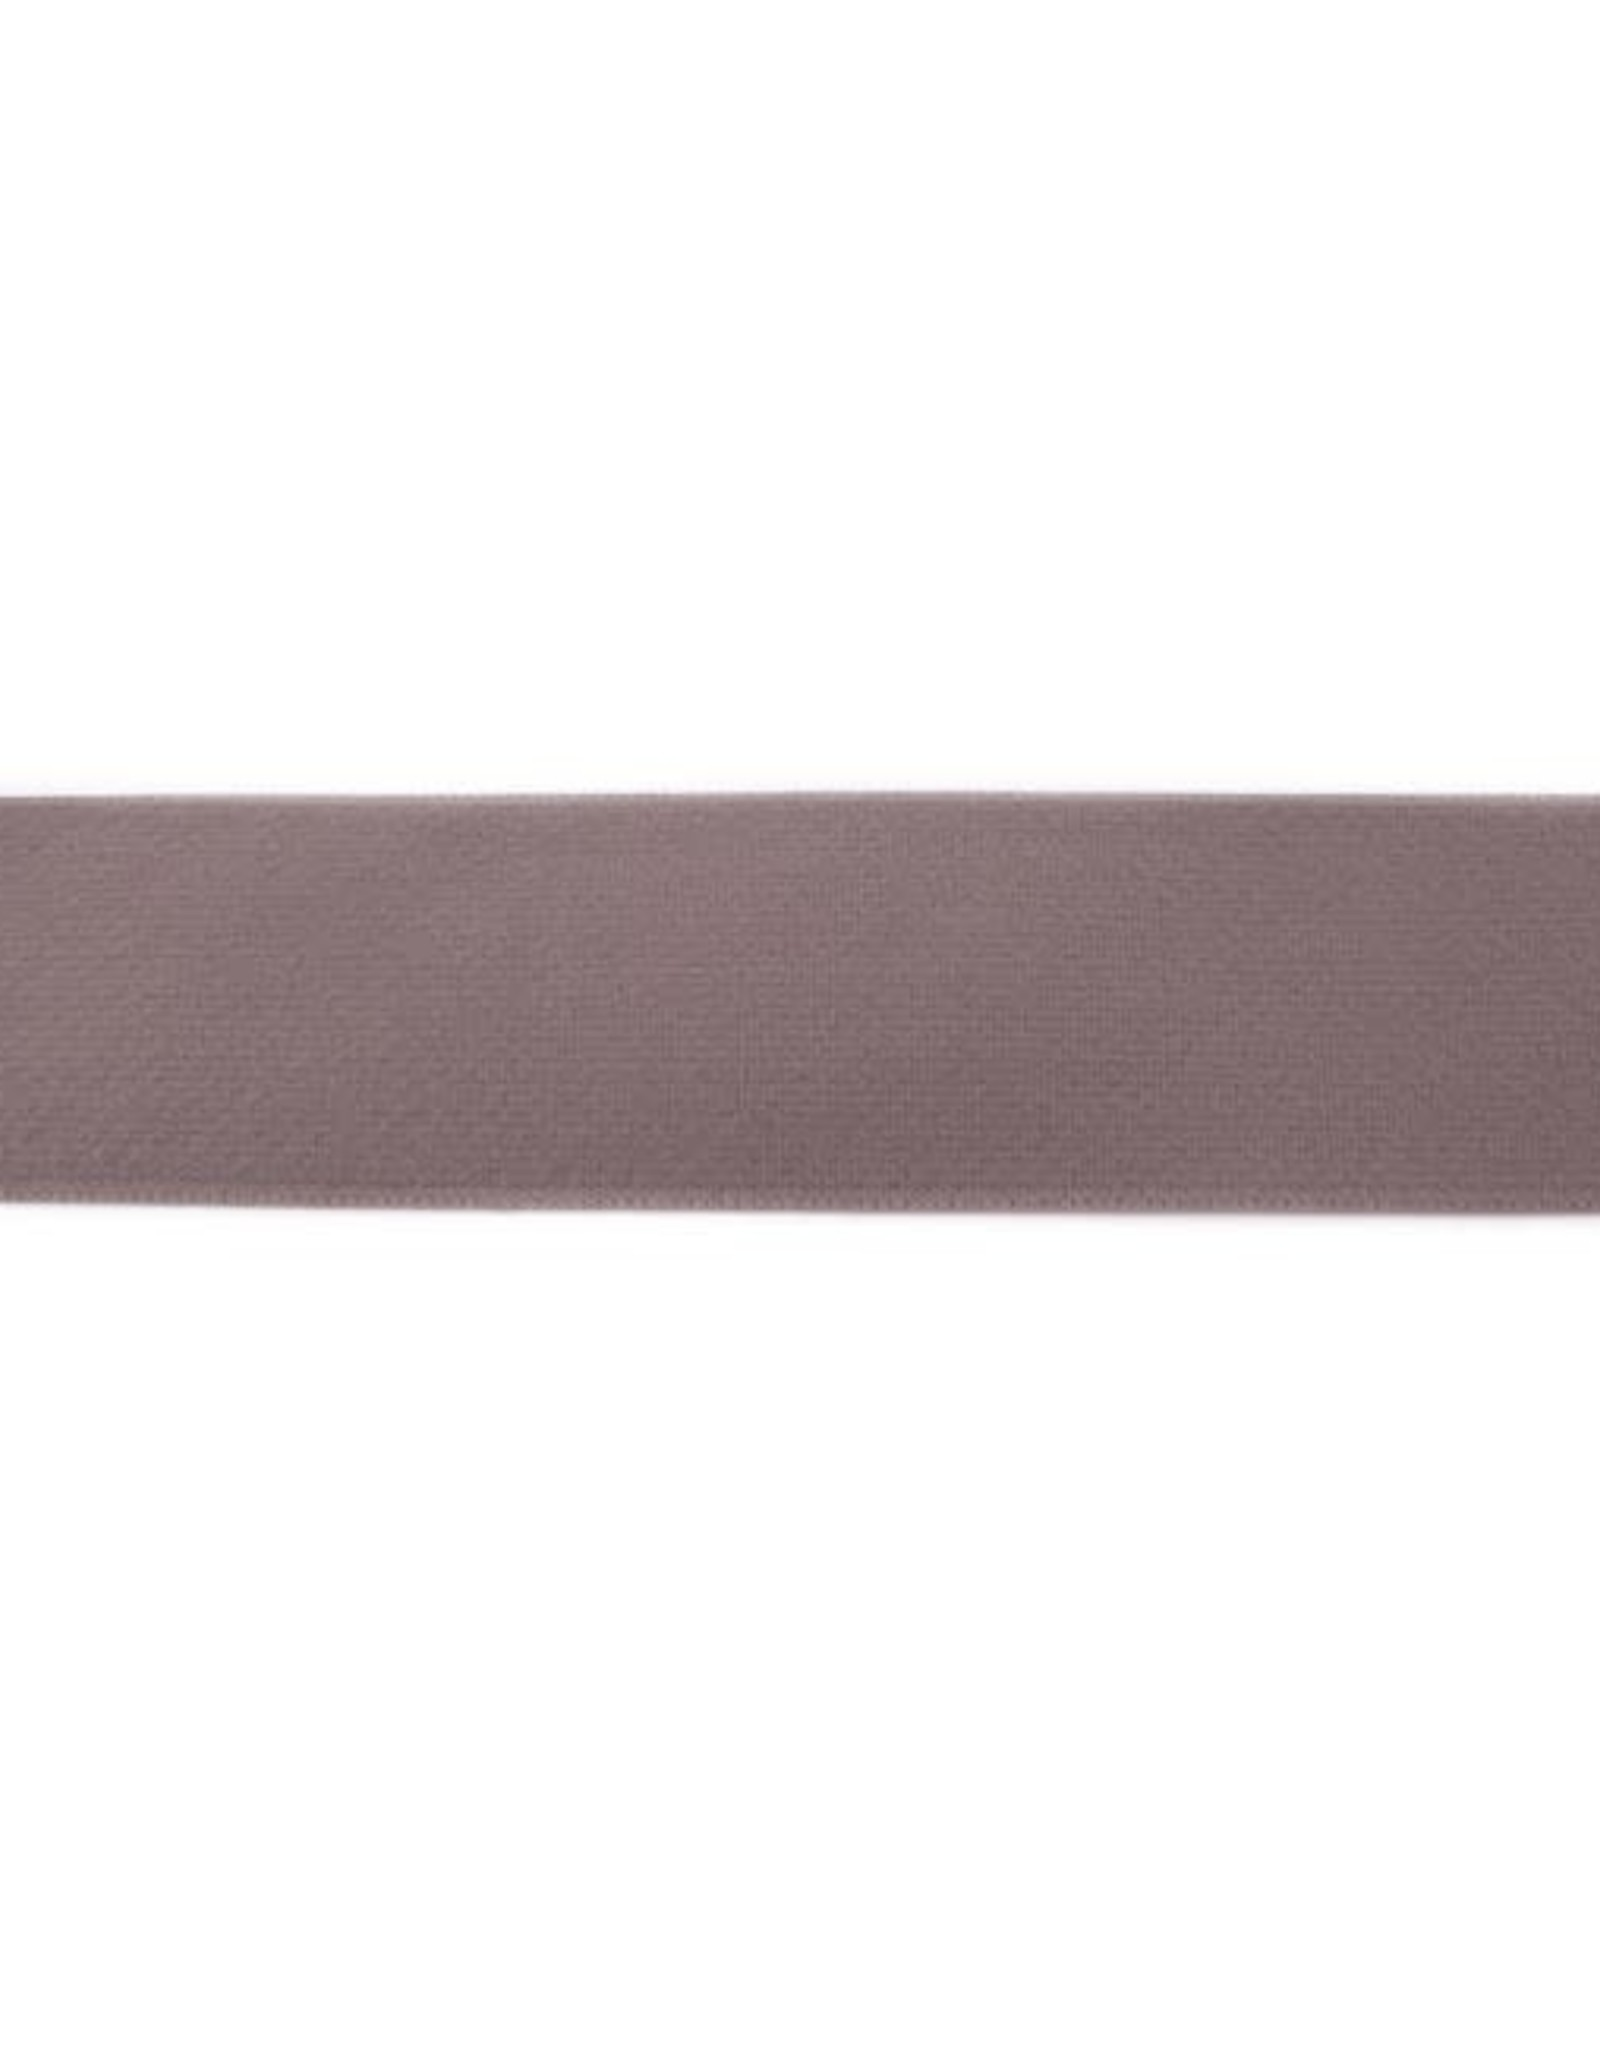 Soft elastiek 40mm - Taupe